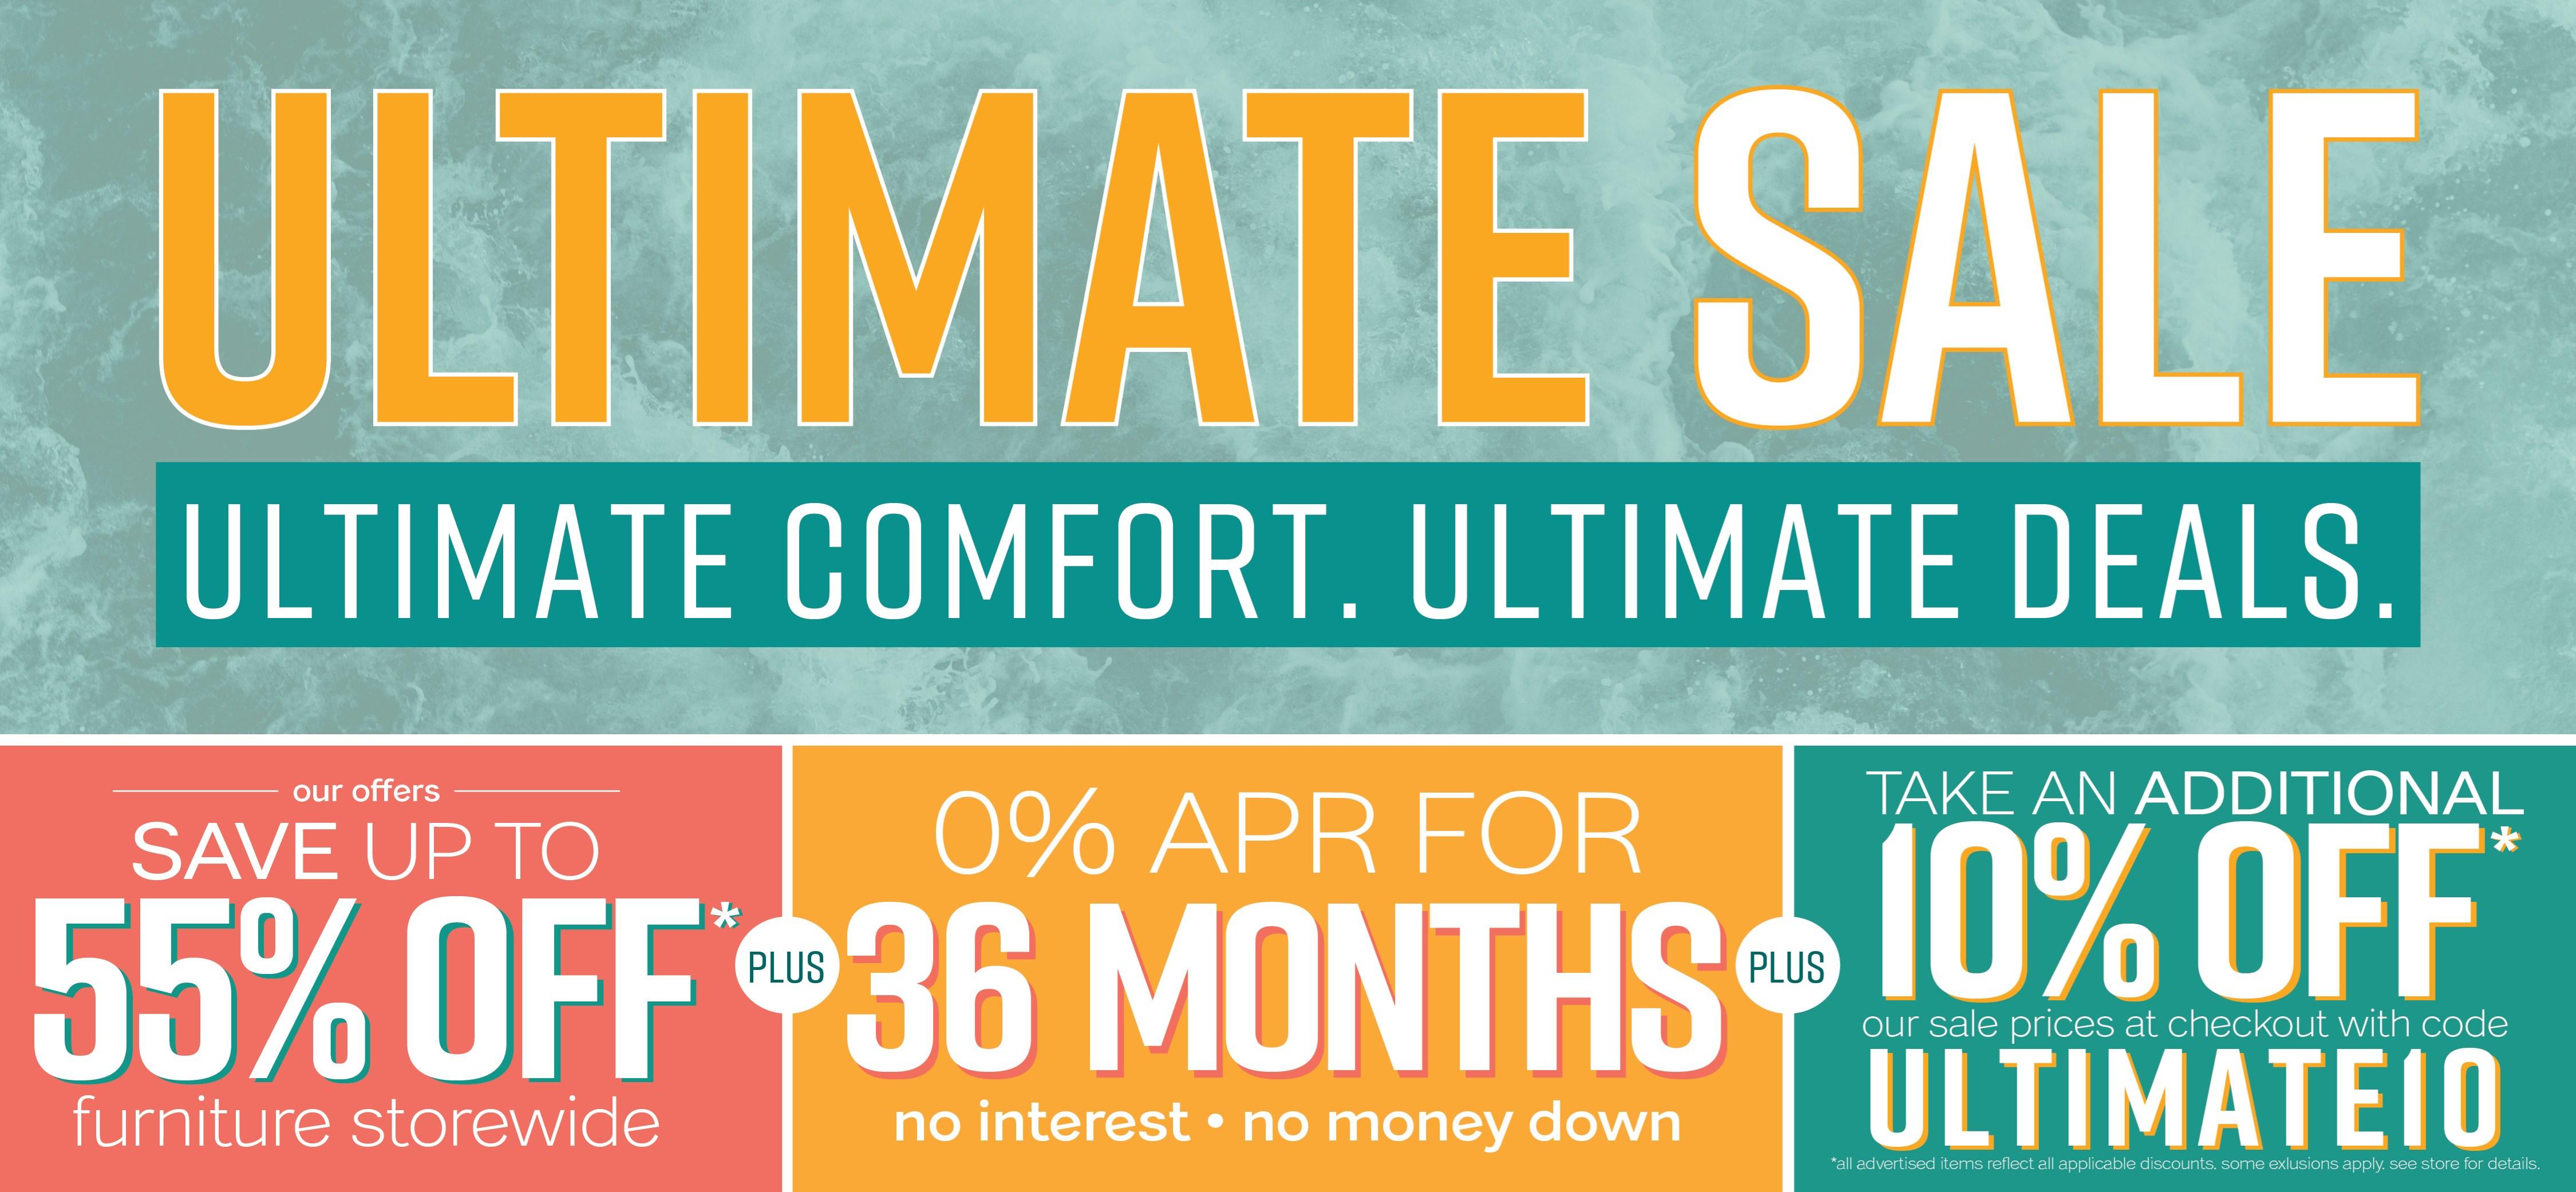 Furniture & ApplianceMart Ultimate Sale